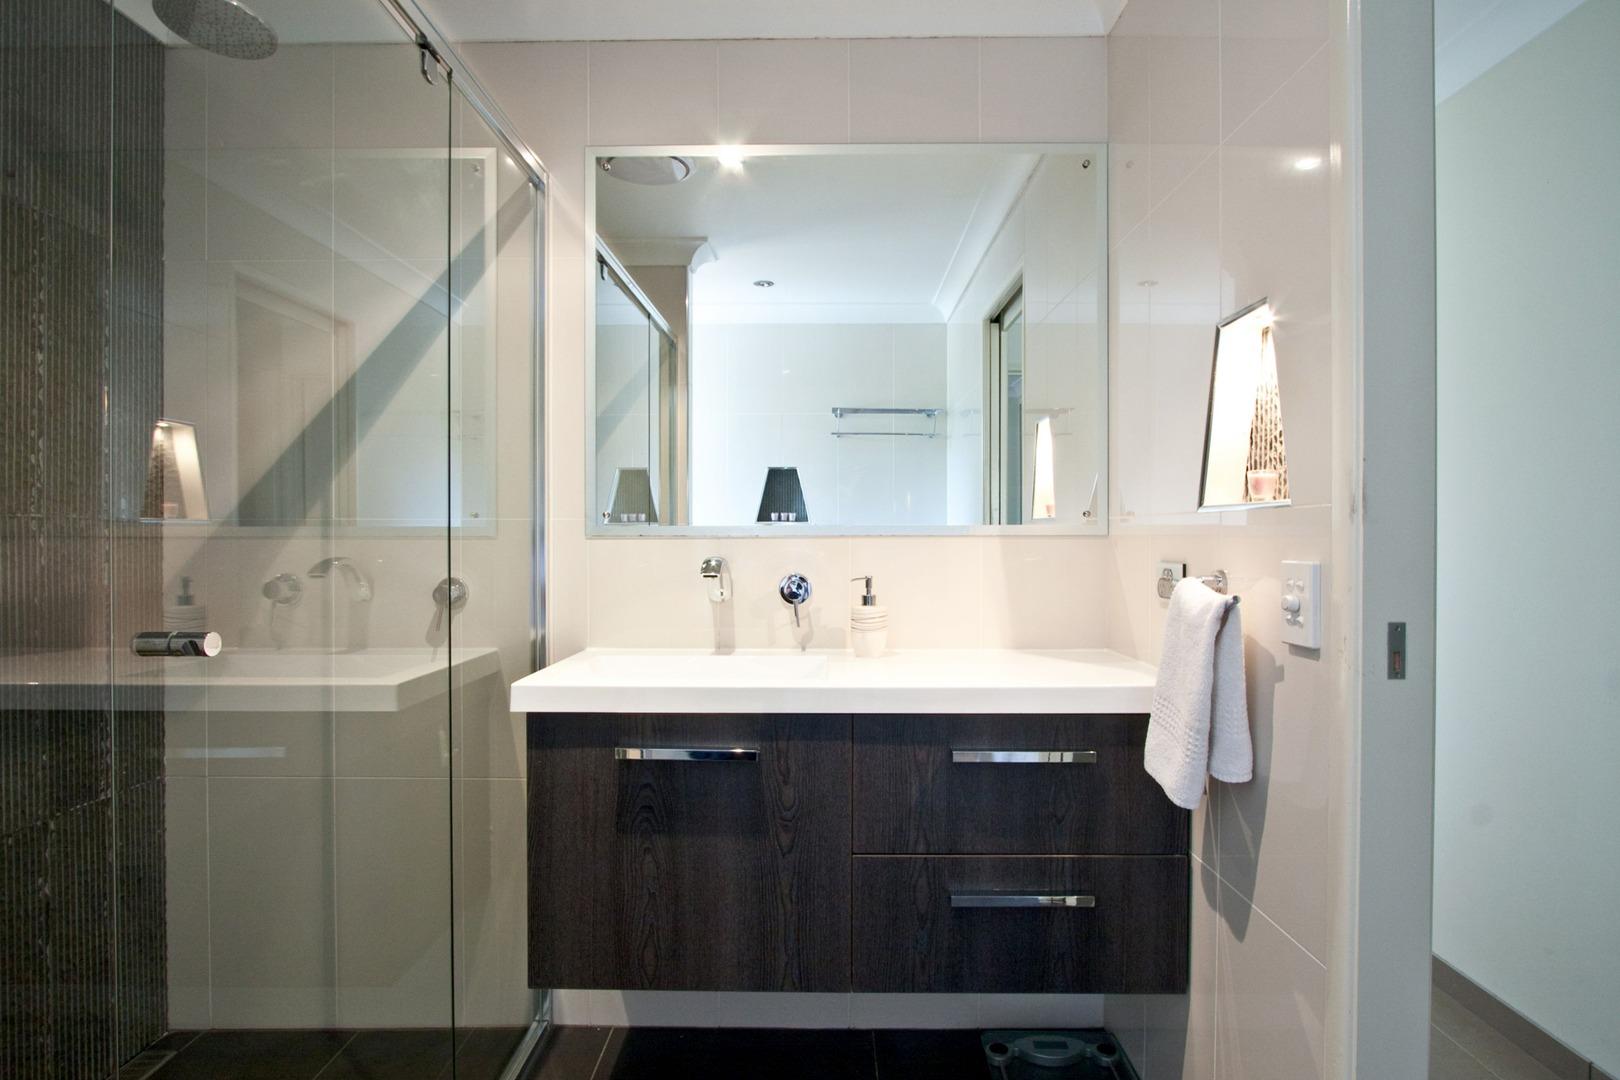 Bathroom remodel toronto - Bathroom Renovations Contractors Bathroom Remodeling Toronto Sina Bathroom Renovations